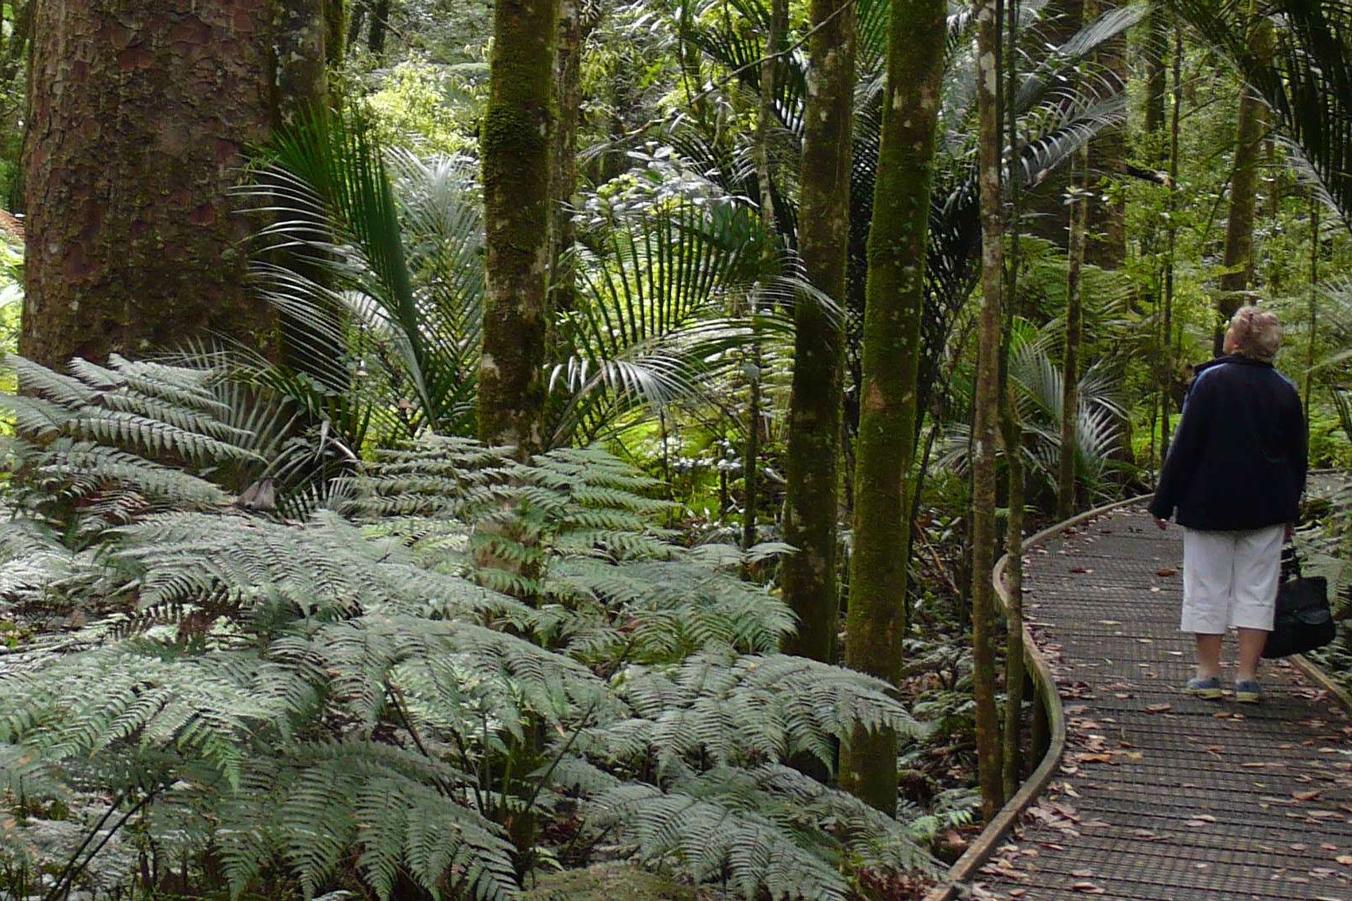 Kauri-Forest-Bay-Of-Island-Tours-H36-photo-credit-NorthlandNZ-com-1-2.jpg